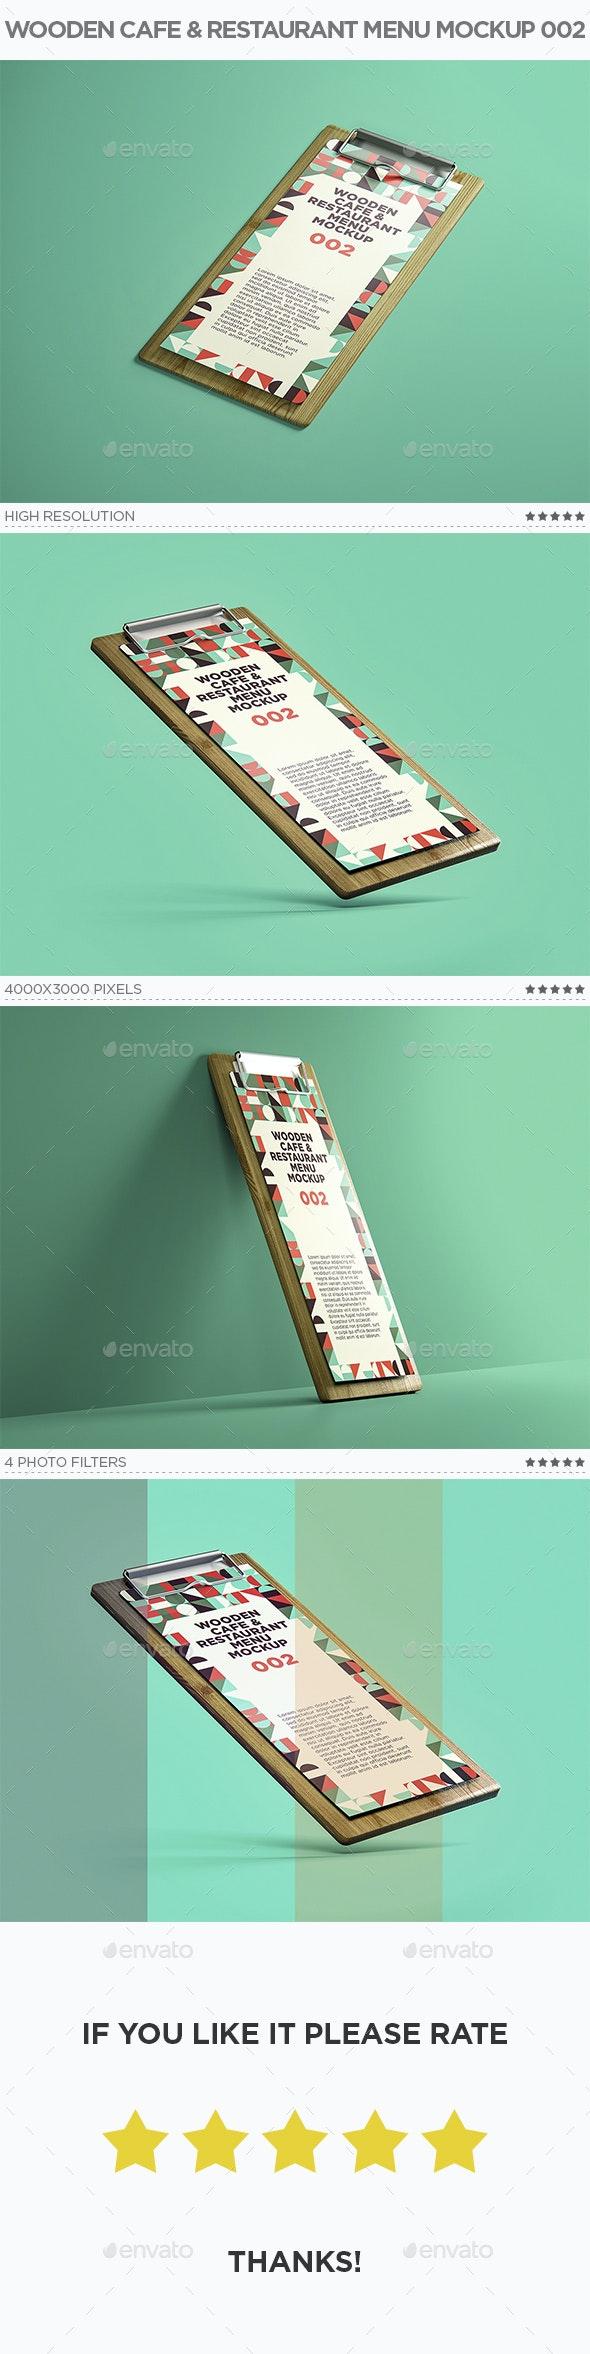 Wooden Cafe & Restaurant Menu Mockup 002 - Miscellaneous Print